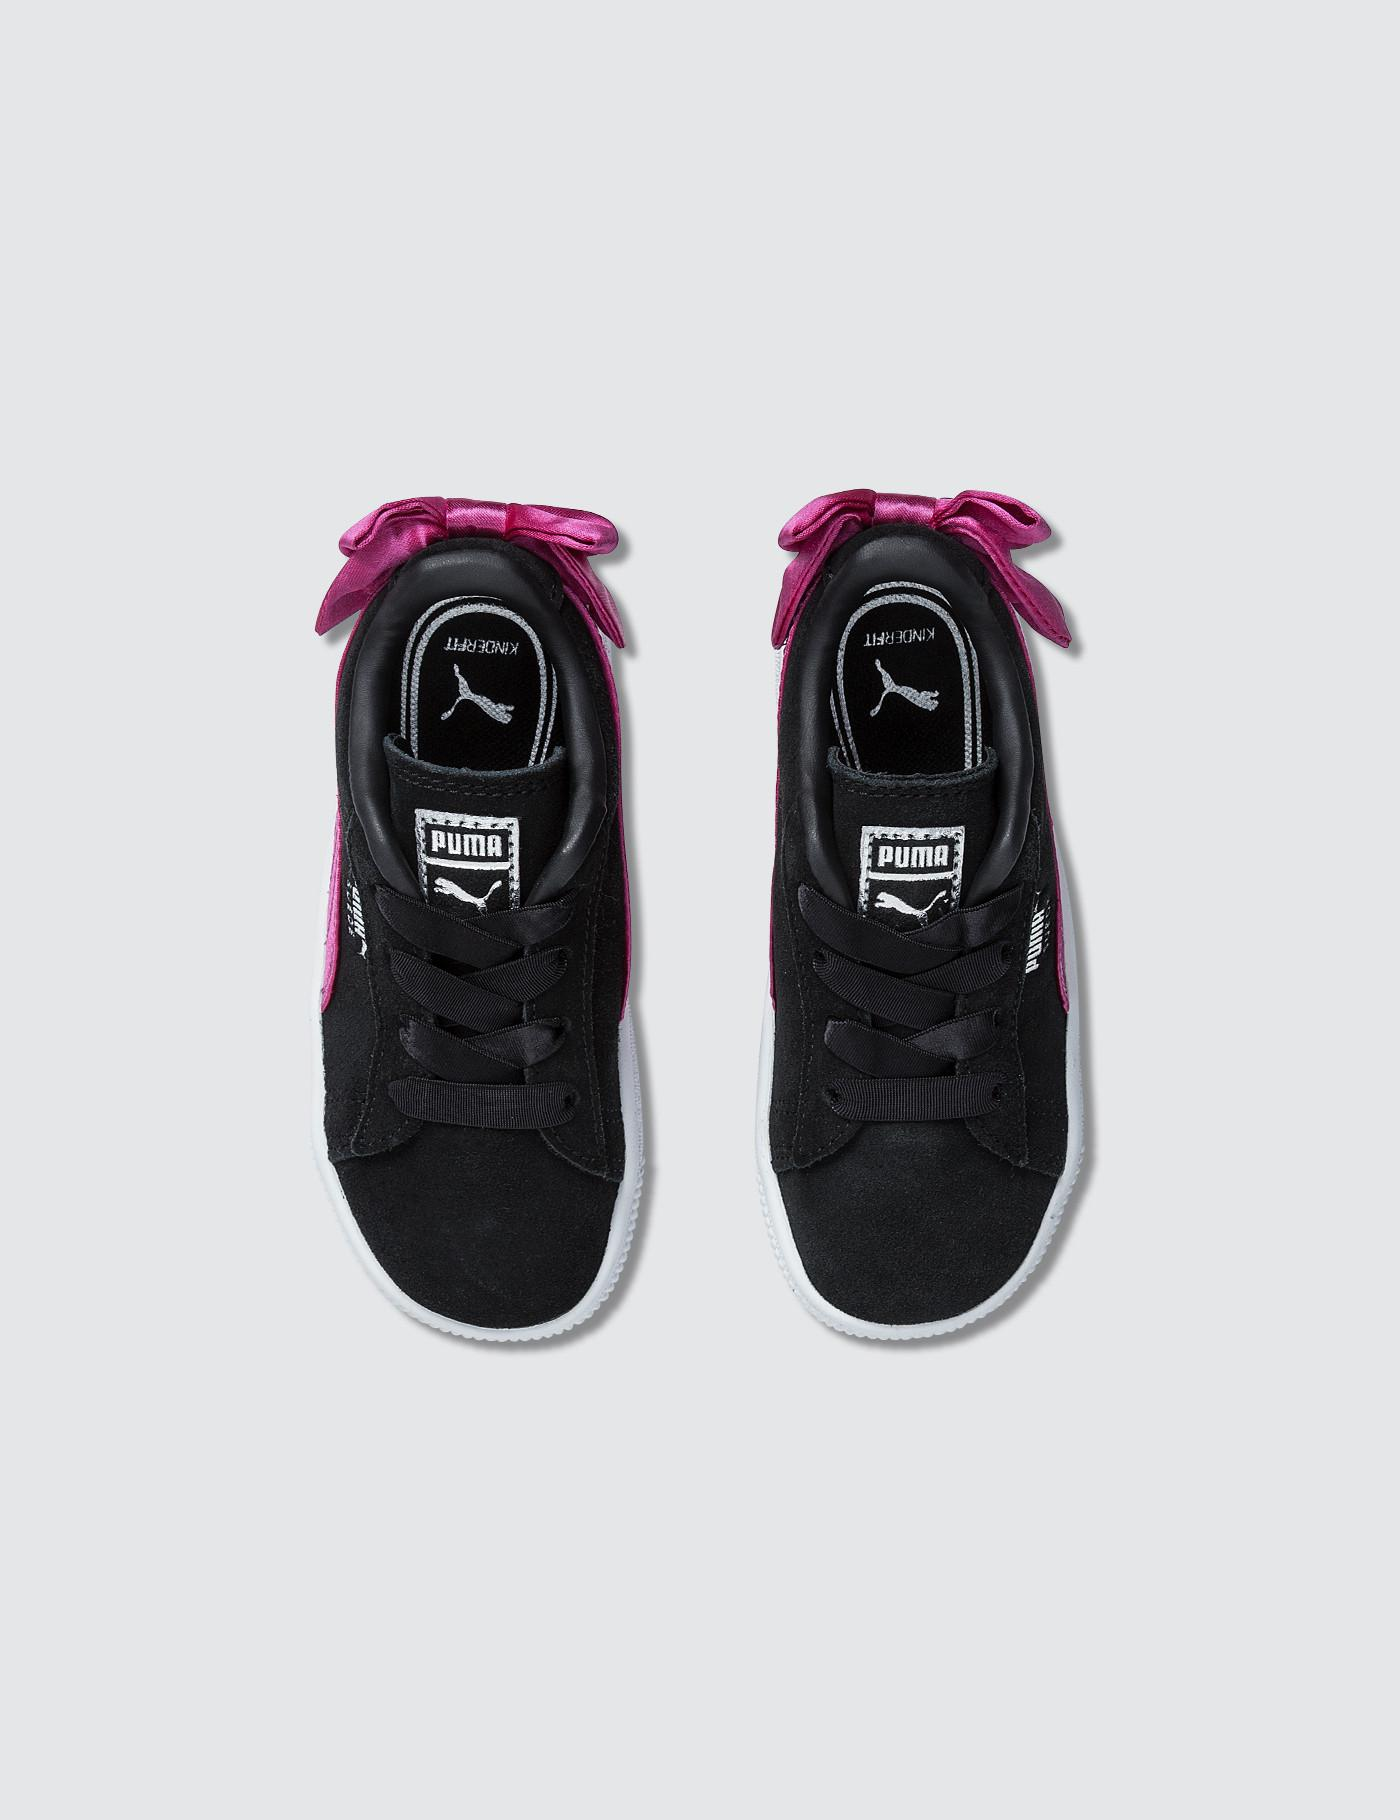 0943b2aaafad Puma Suede Bow Ac Infant in Purple - Lyst